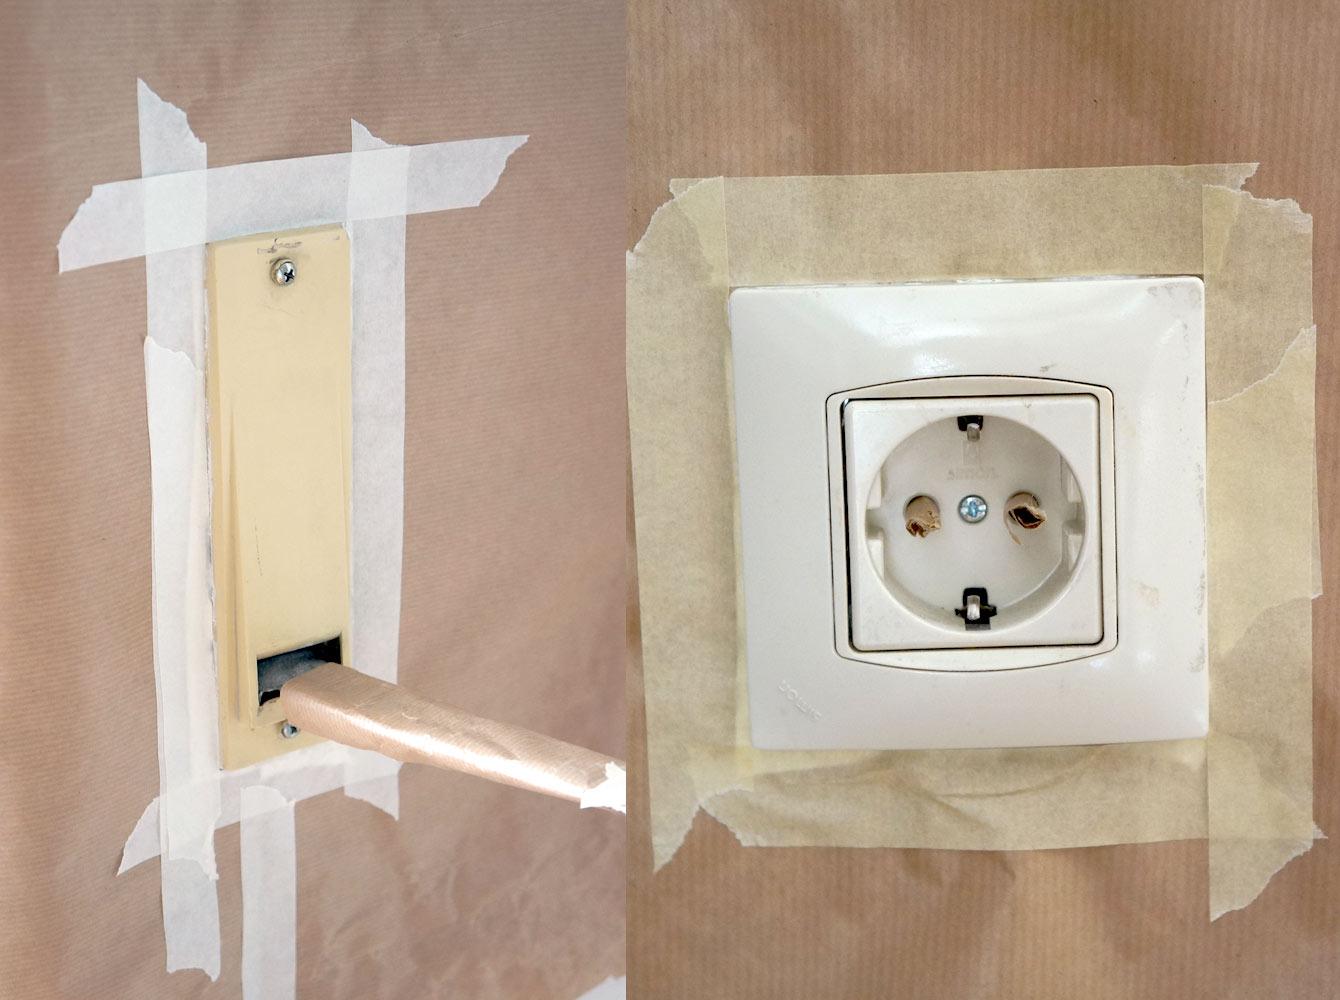 C mo pintar los enchufes e interruptores blog decoraci n - Interruptores y enchufes ...